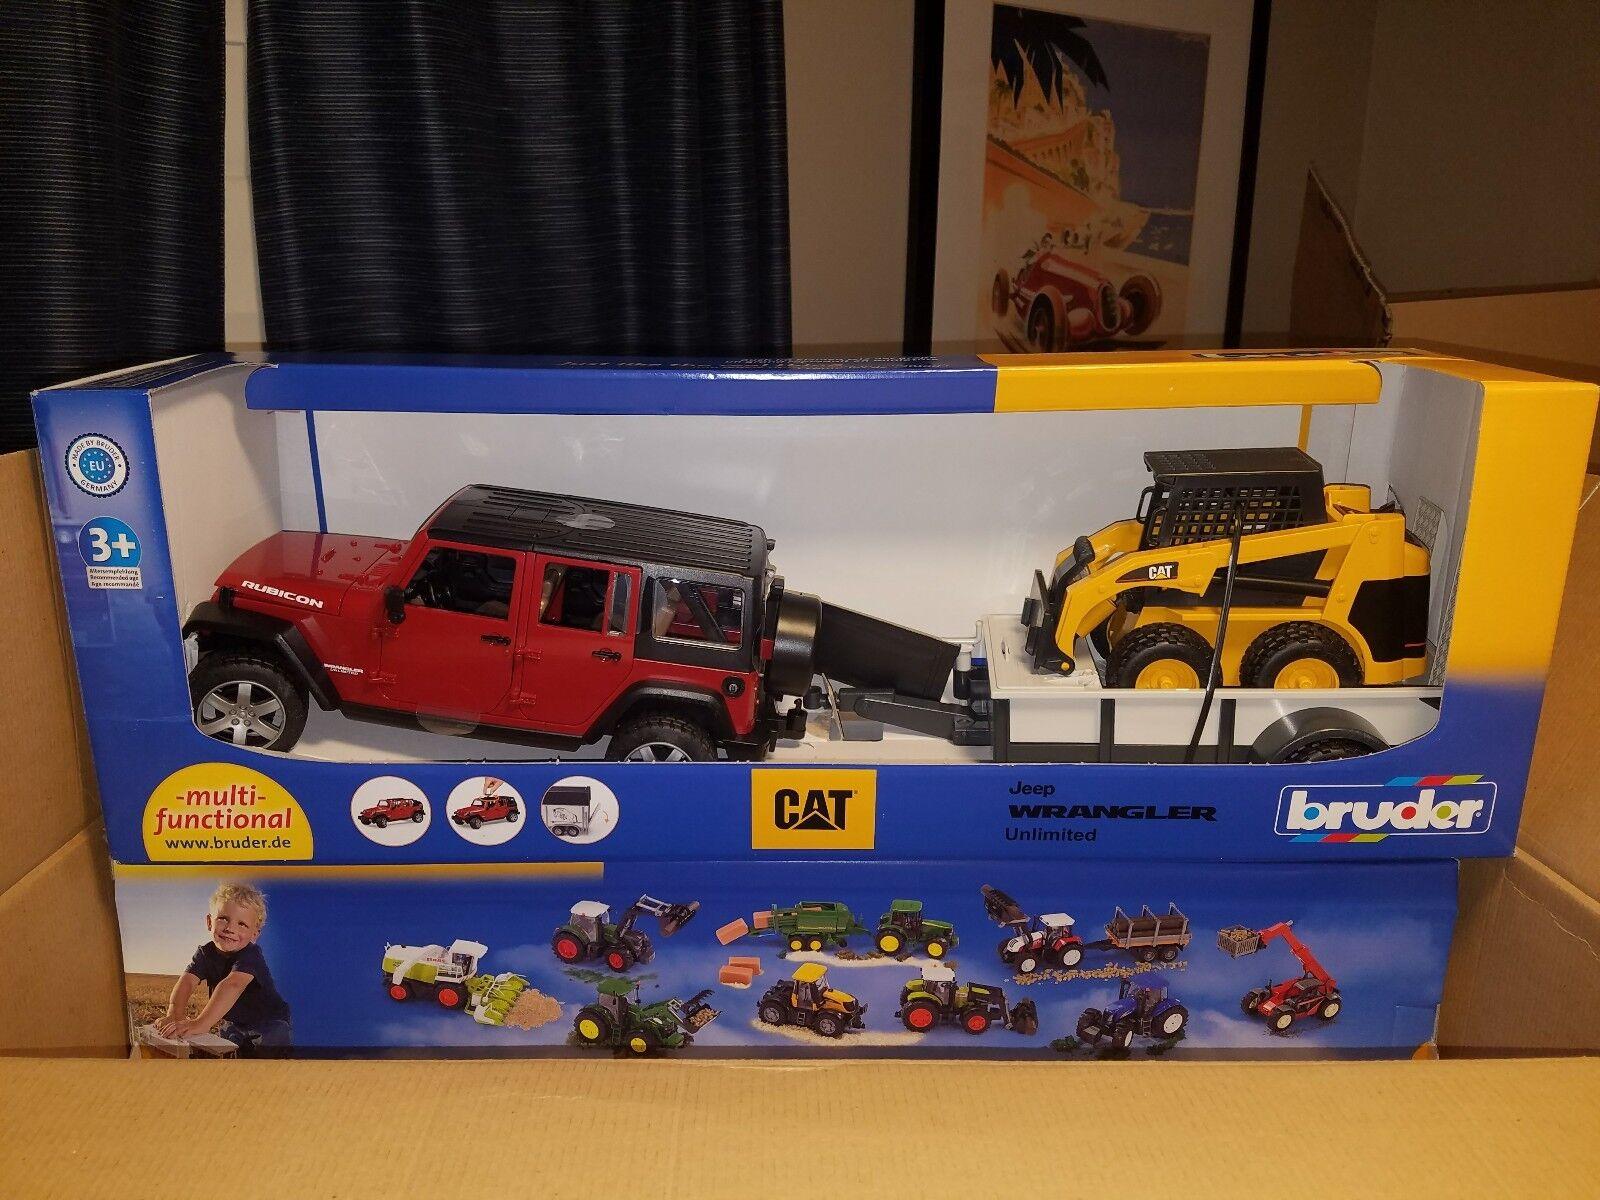 Bruder Toys Jeep Wrangler Unlimited Rubicon Avec Remorque & Chat Skid Steer Loader